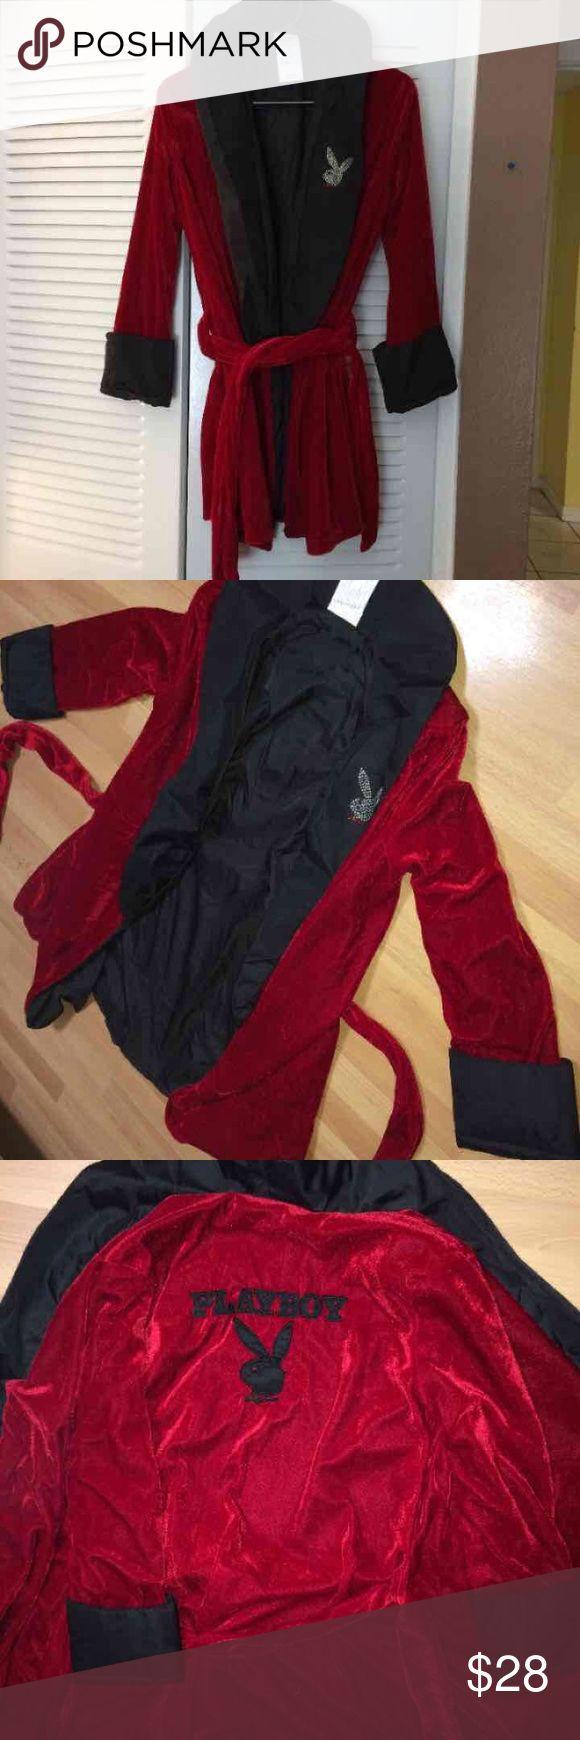 Best ideas about Hugh Hefner Costume DIY . Save or Pin 25 best ideas about Hugh hefner costume on Pinterest Now.